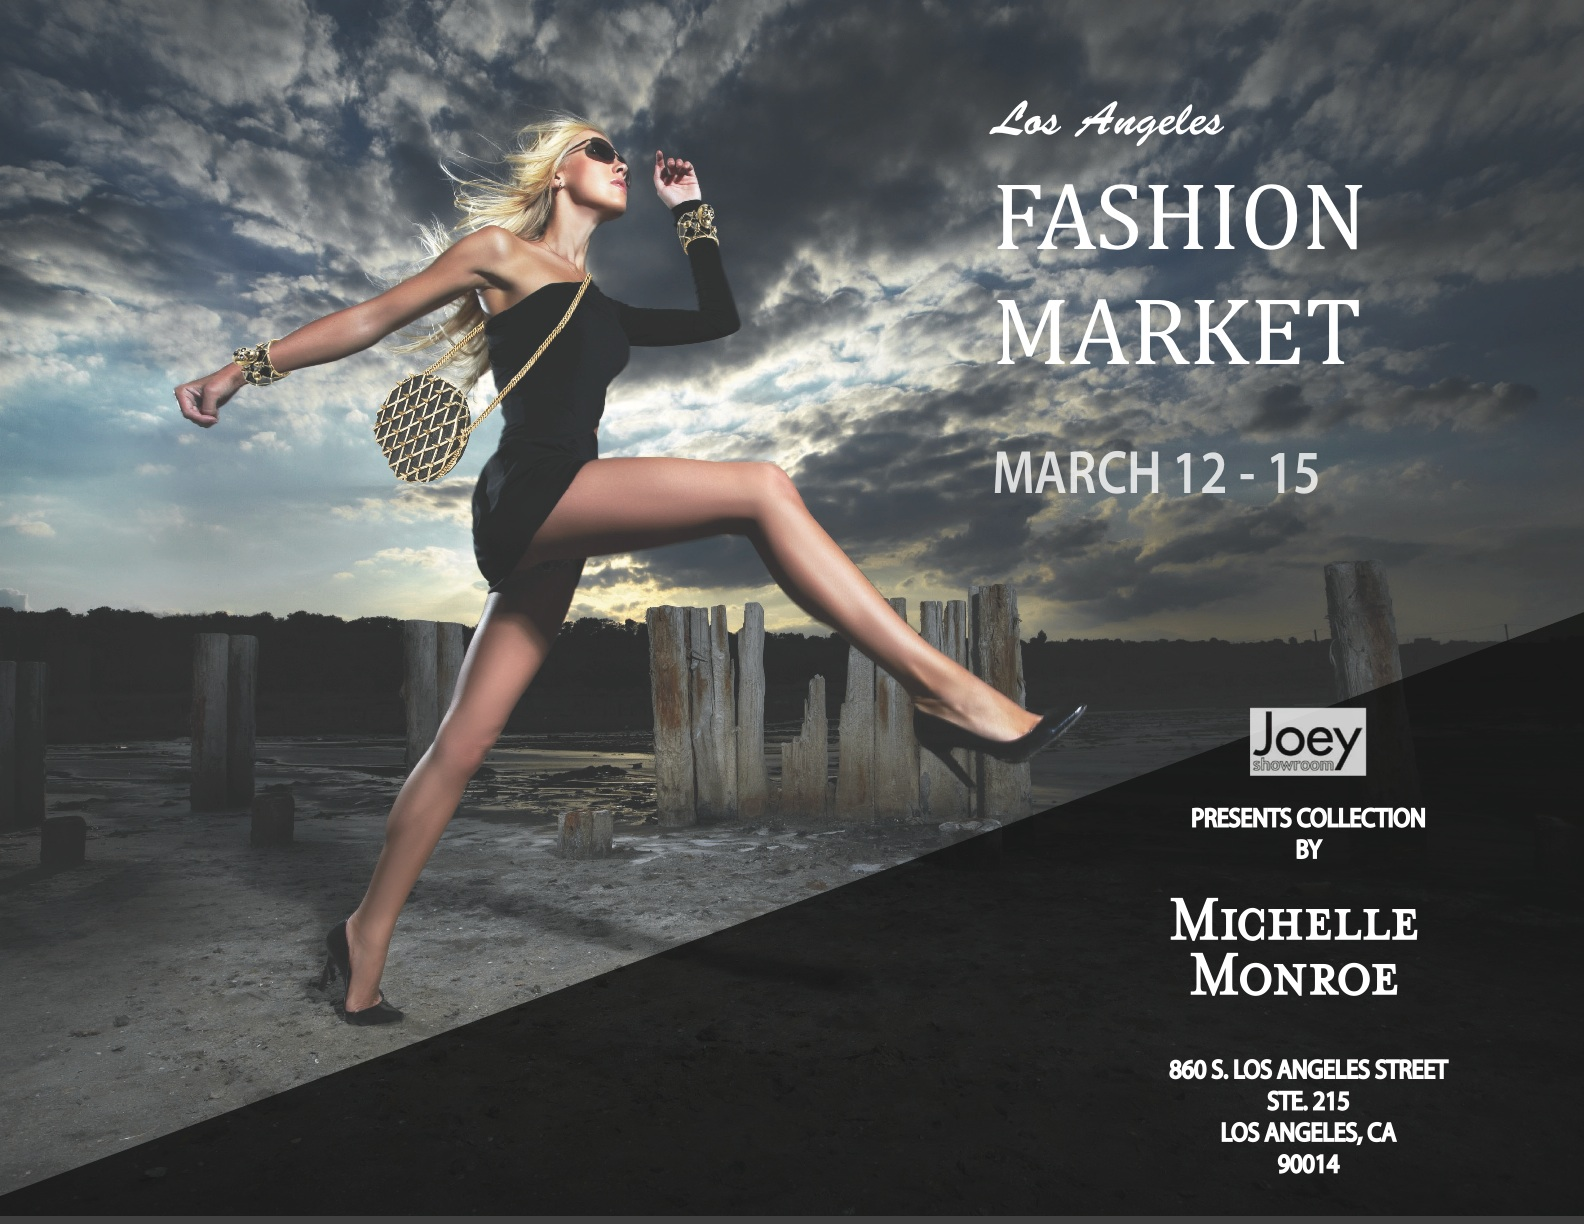 http://3.bp.blogspot.com/-V862SnA1KQw/T14iFA8pUZI/AAAAAAAABko/-qPVddEDwx4/s1600/Michelle+Monroe+Market+Flyer.jpg